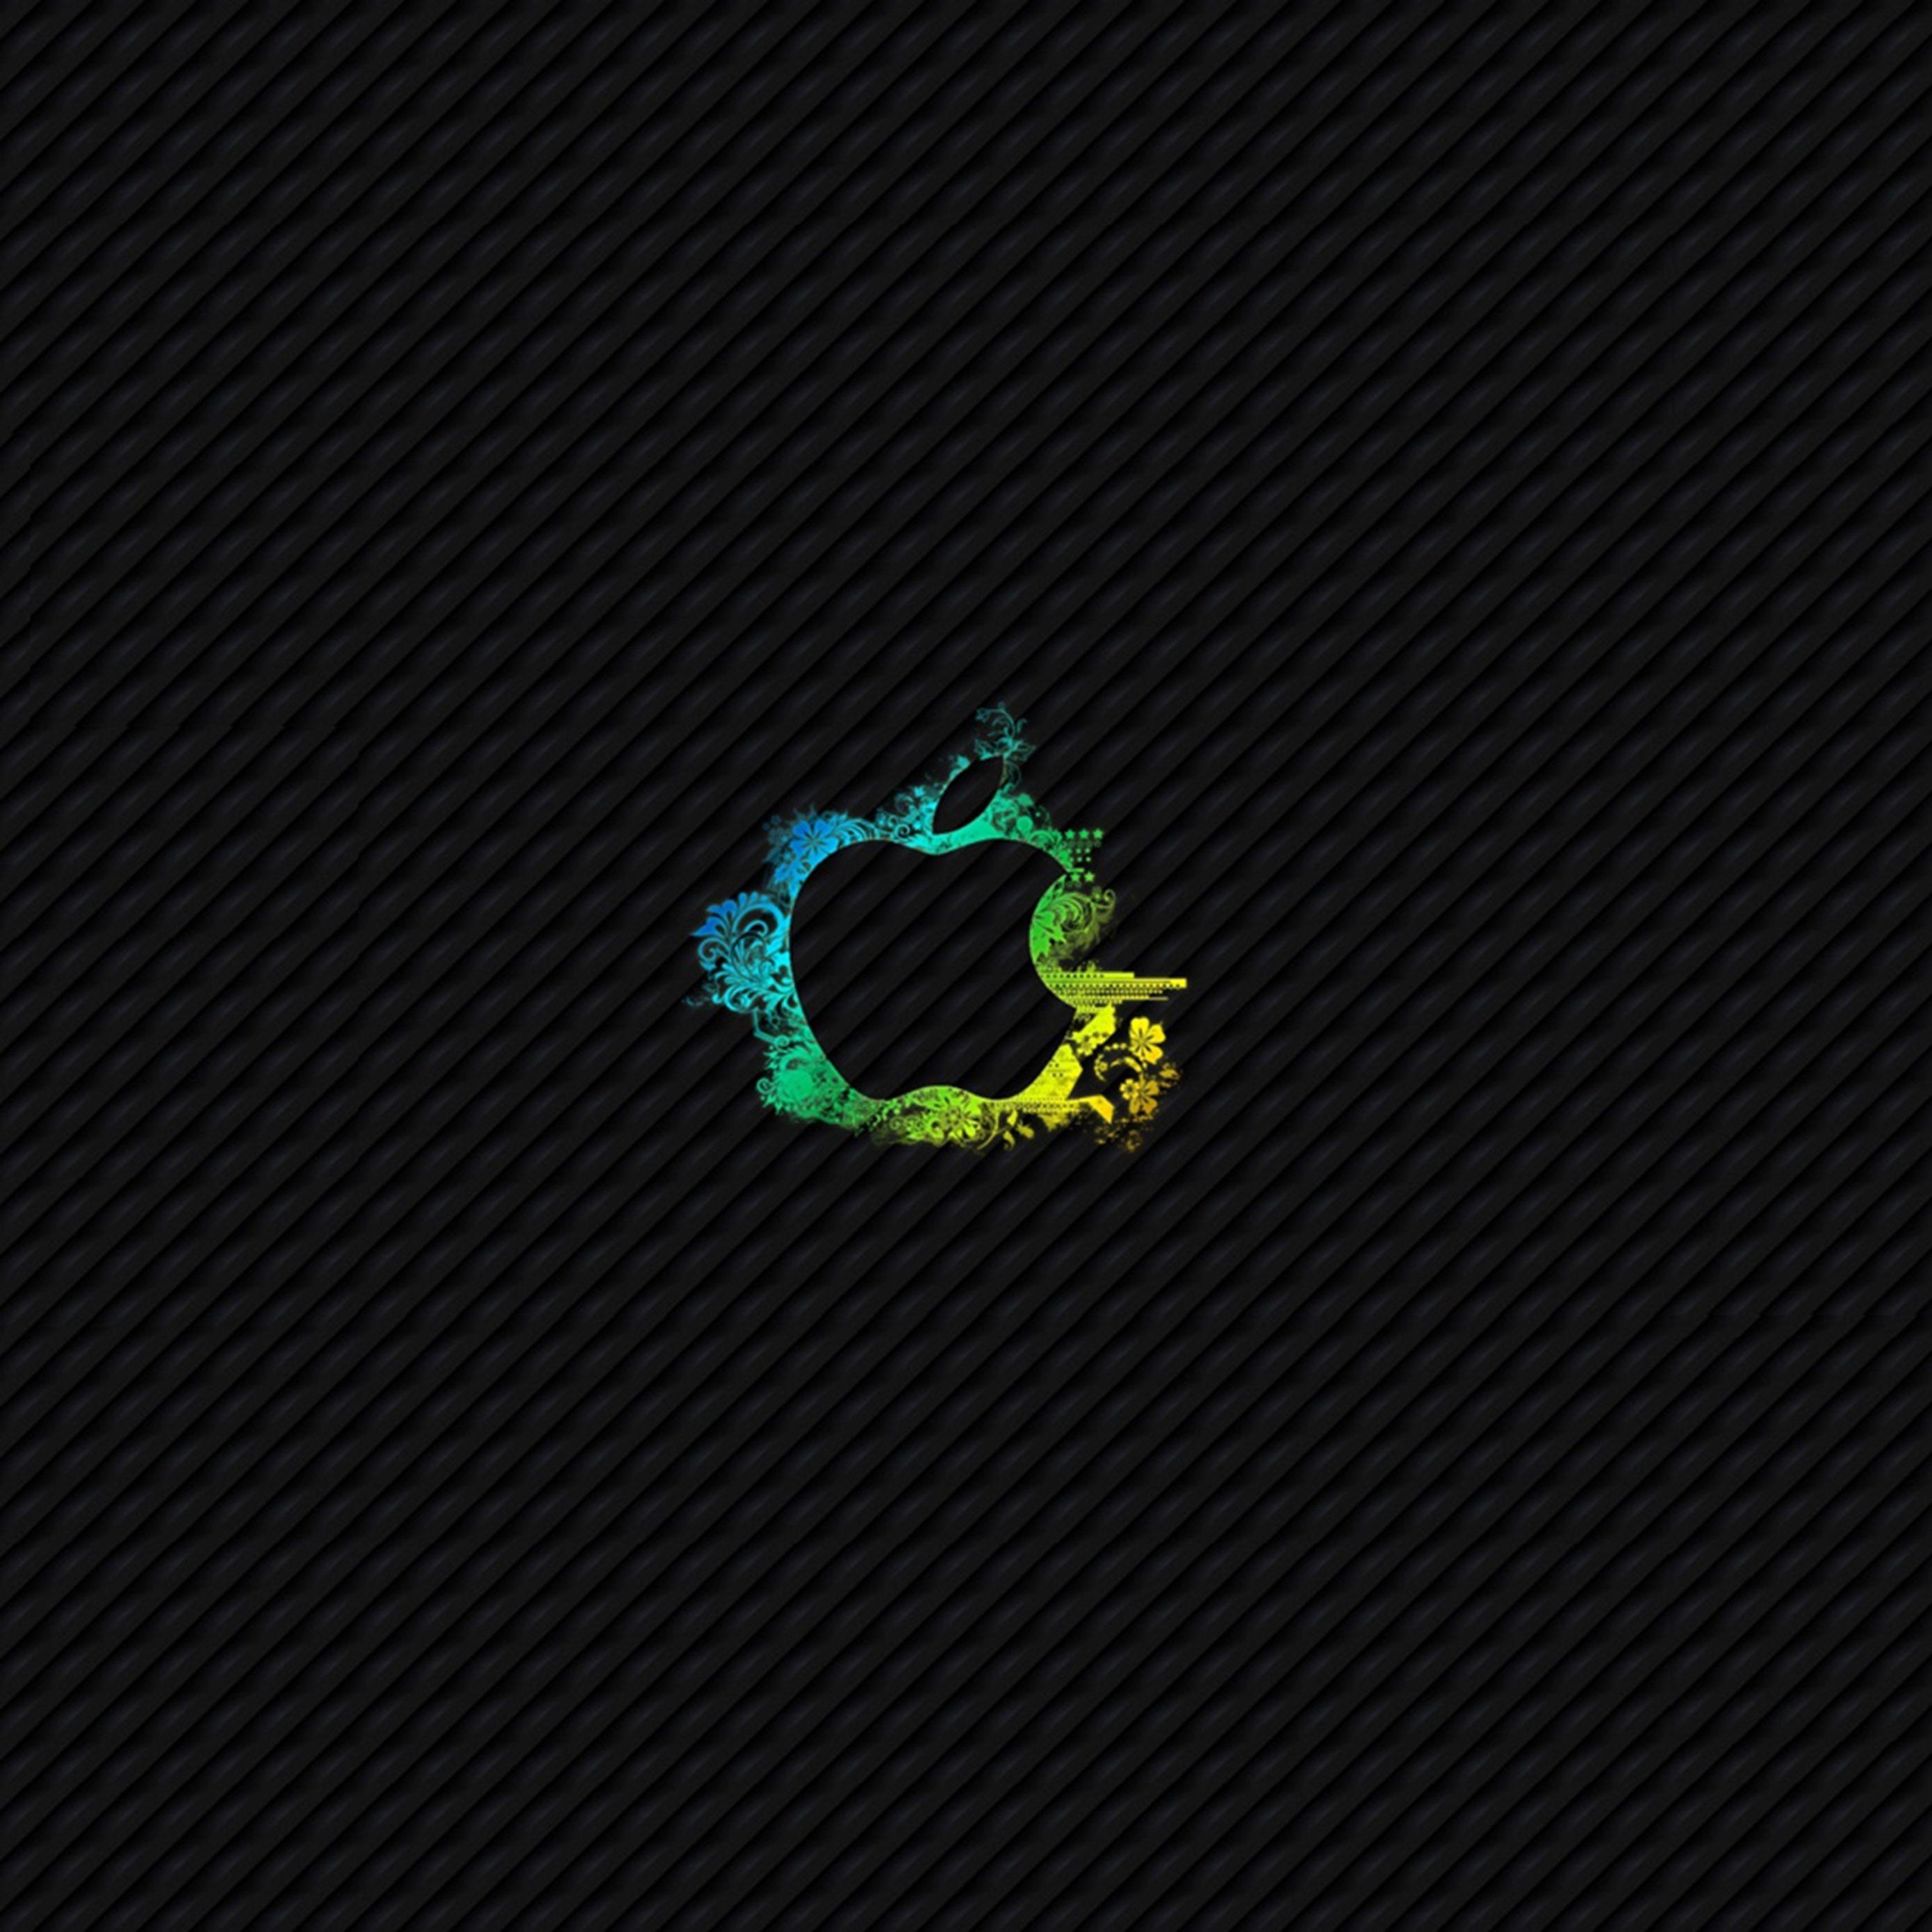 2780x2780 Parallax wallpaper 4k Apple Wallpaper Ipad Wallpaper 2780x2780 pixels resolution